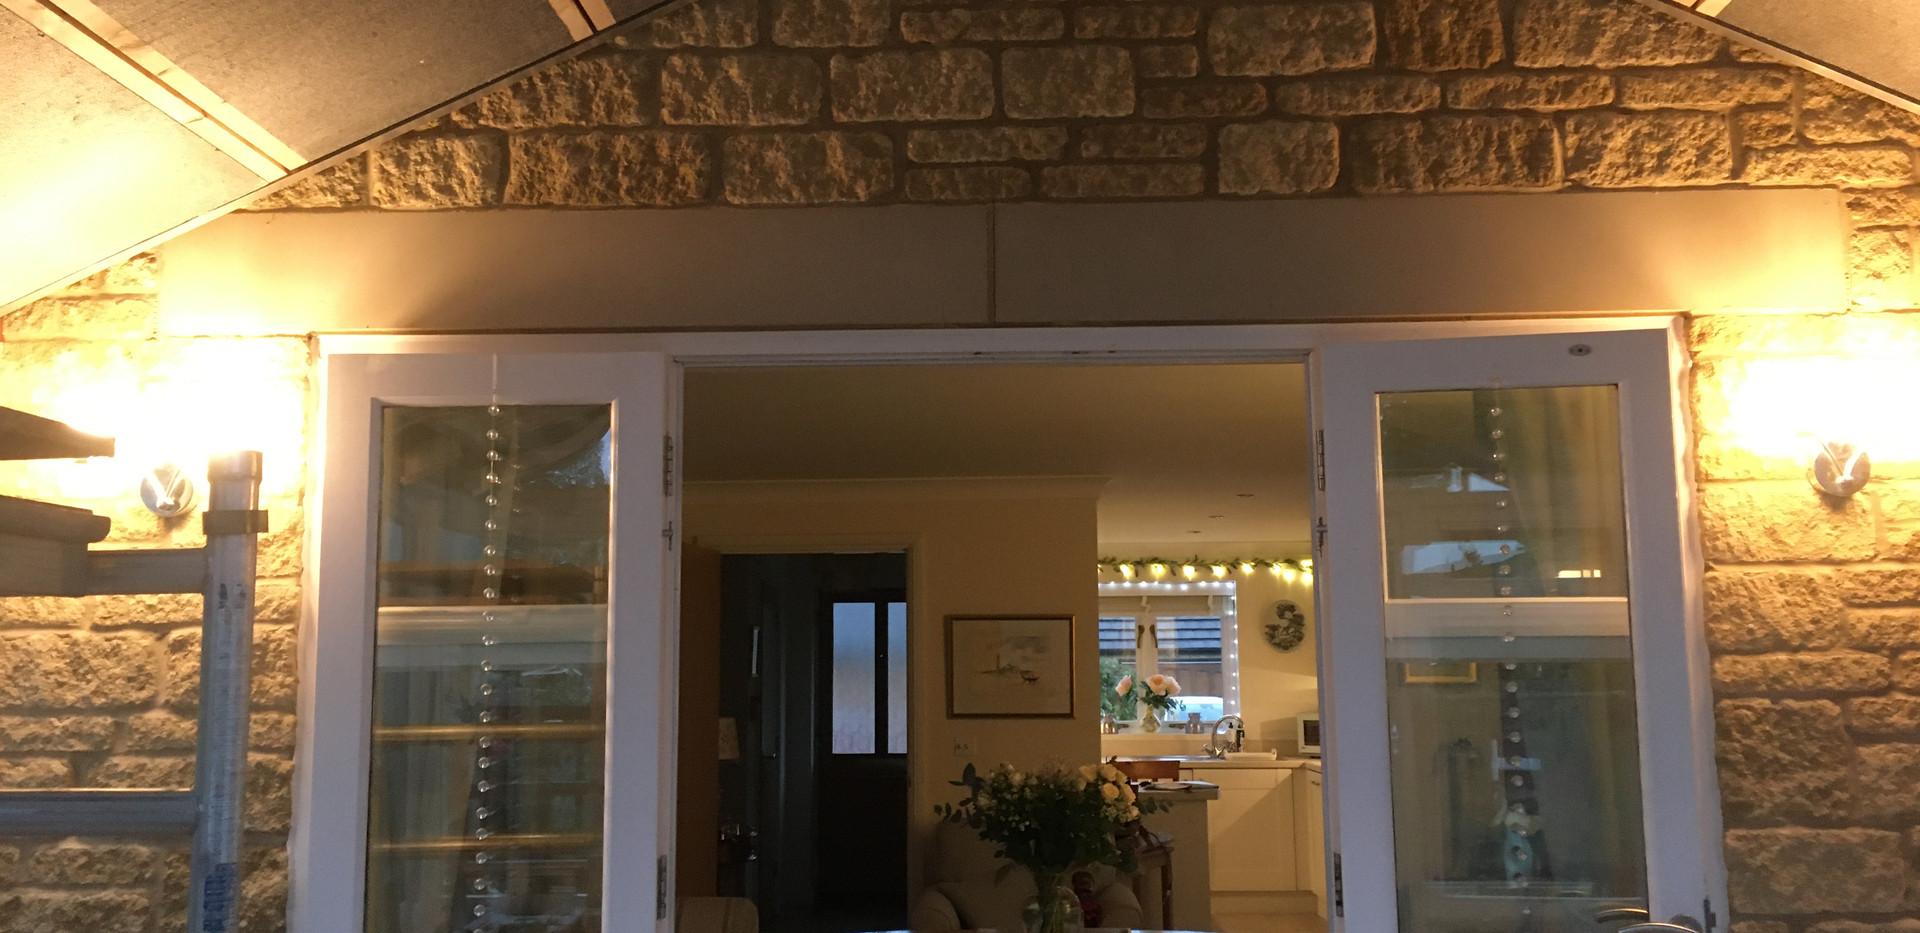 Before ceiling plastered